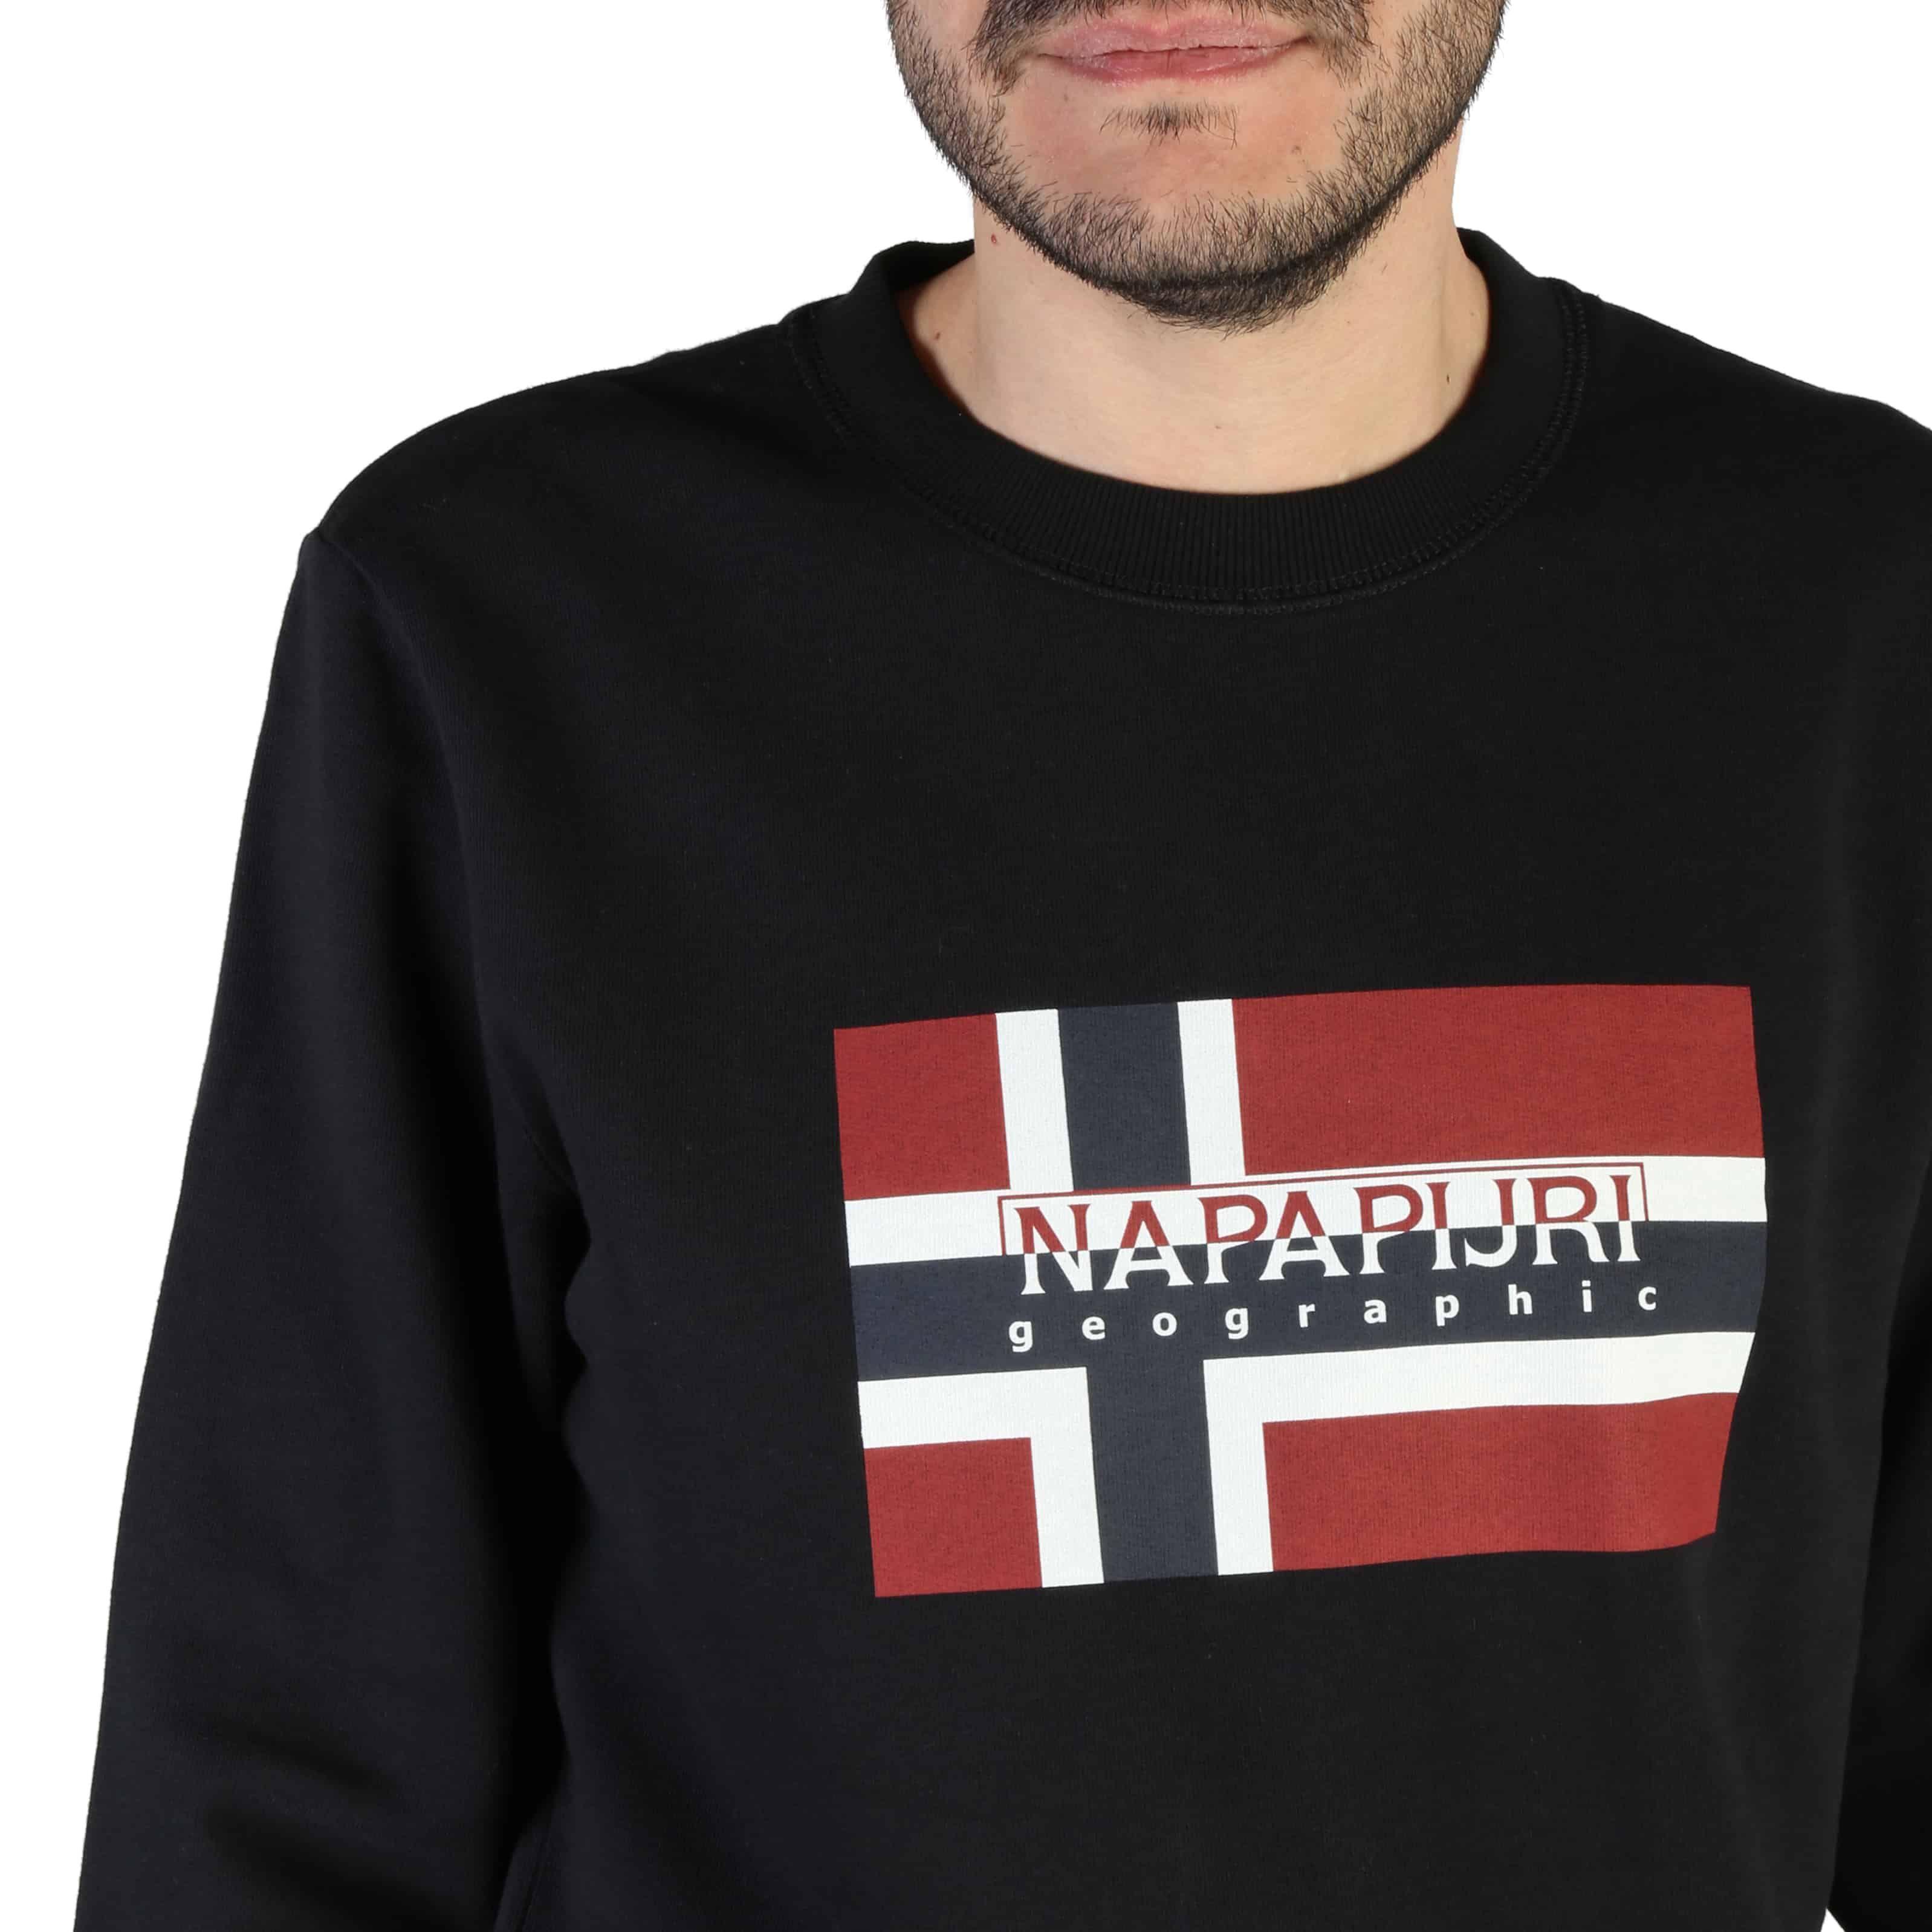 Napapijri | You Fashion Outlet